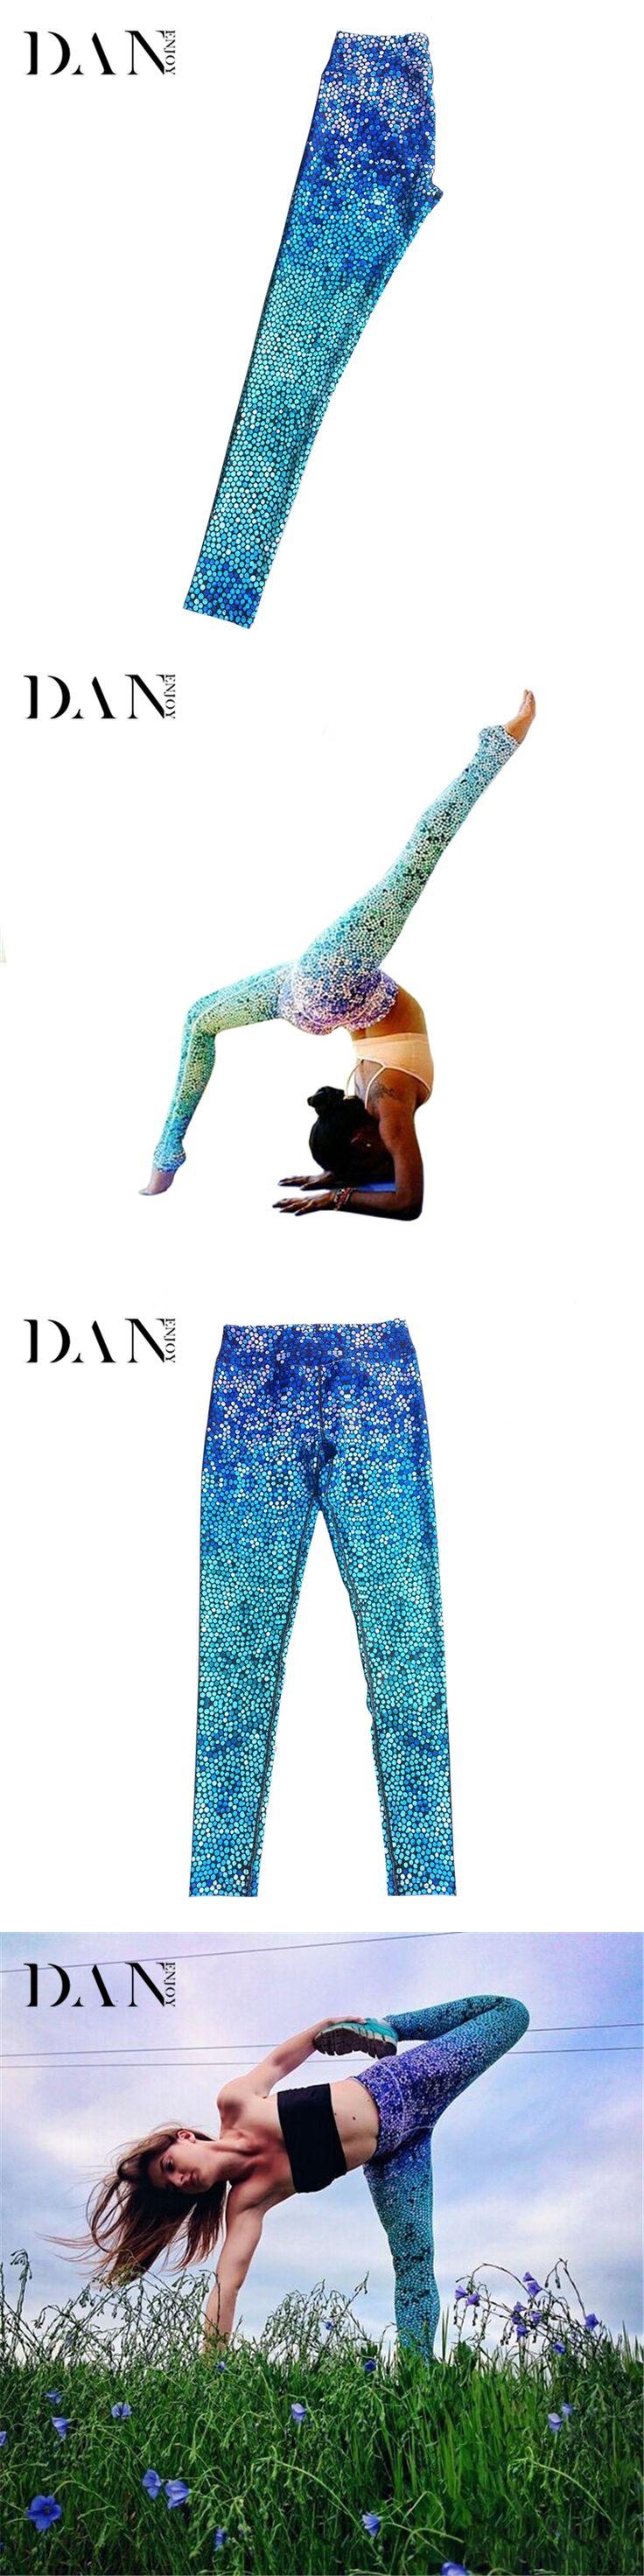 DANENJOY Womens Blue Mermaid Gradient Color 3D Print Tight Pants Breathable Leggings Slim Pants Stretch Trouser Skinny Leggings